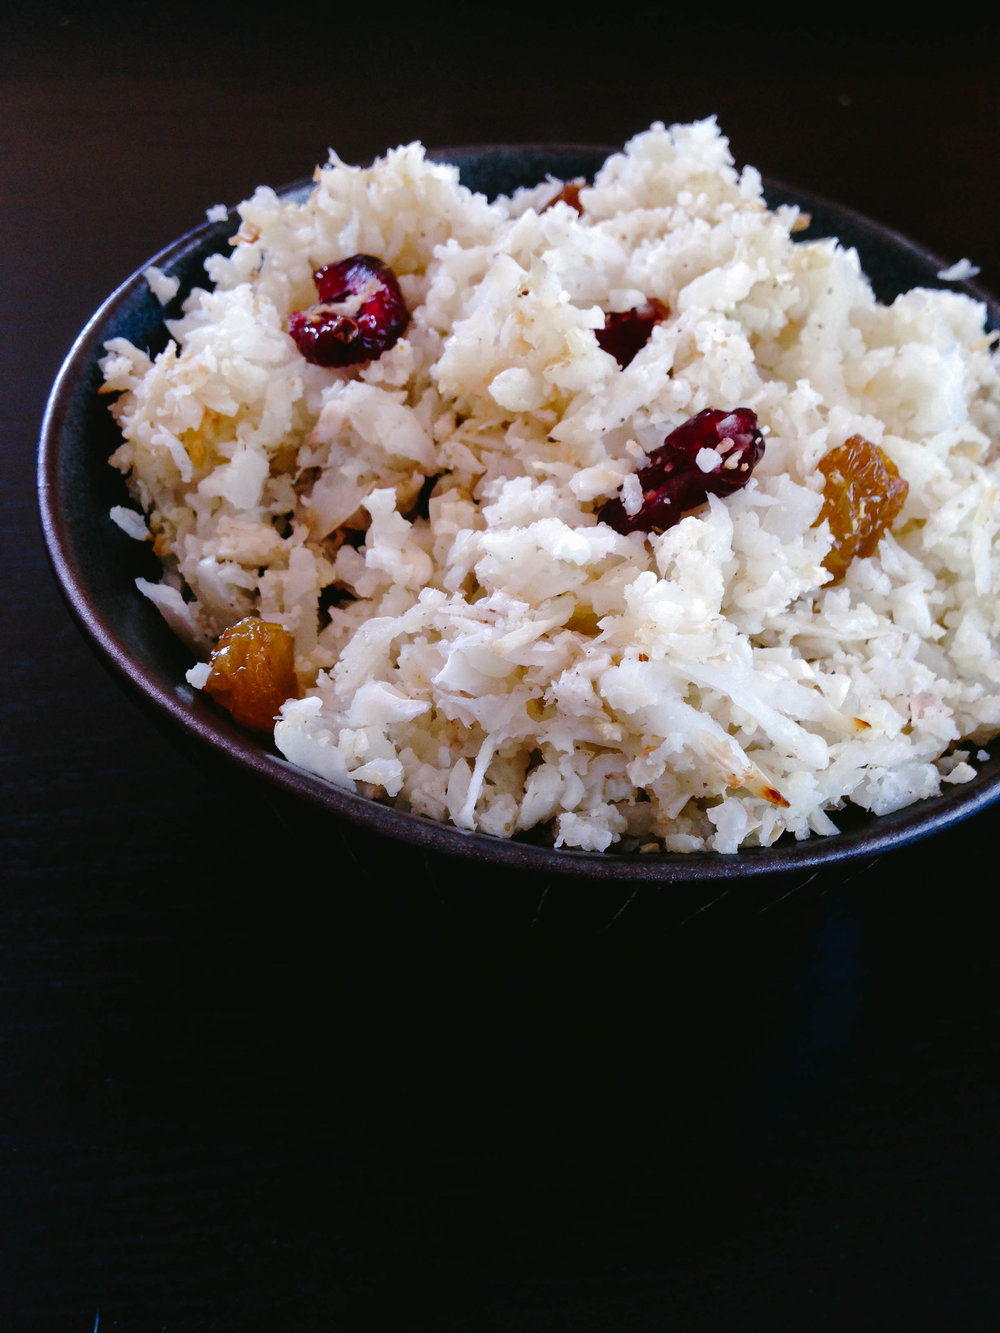 South-Indian-Cauliflower-Rice-Pulao-1.jpg